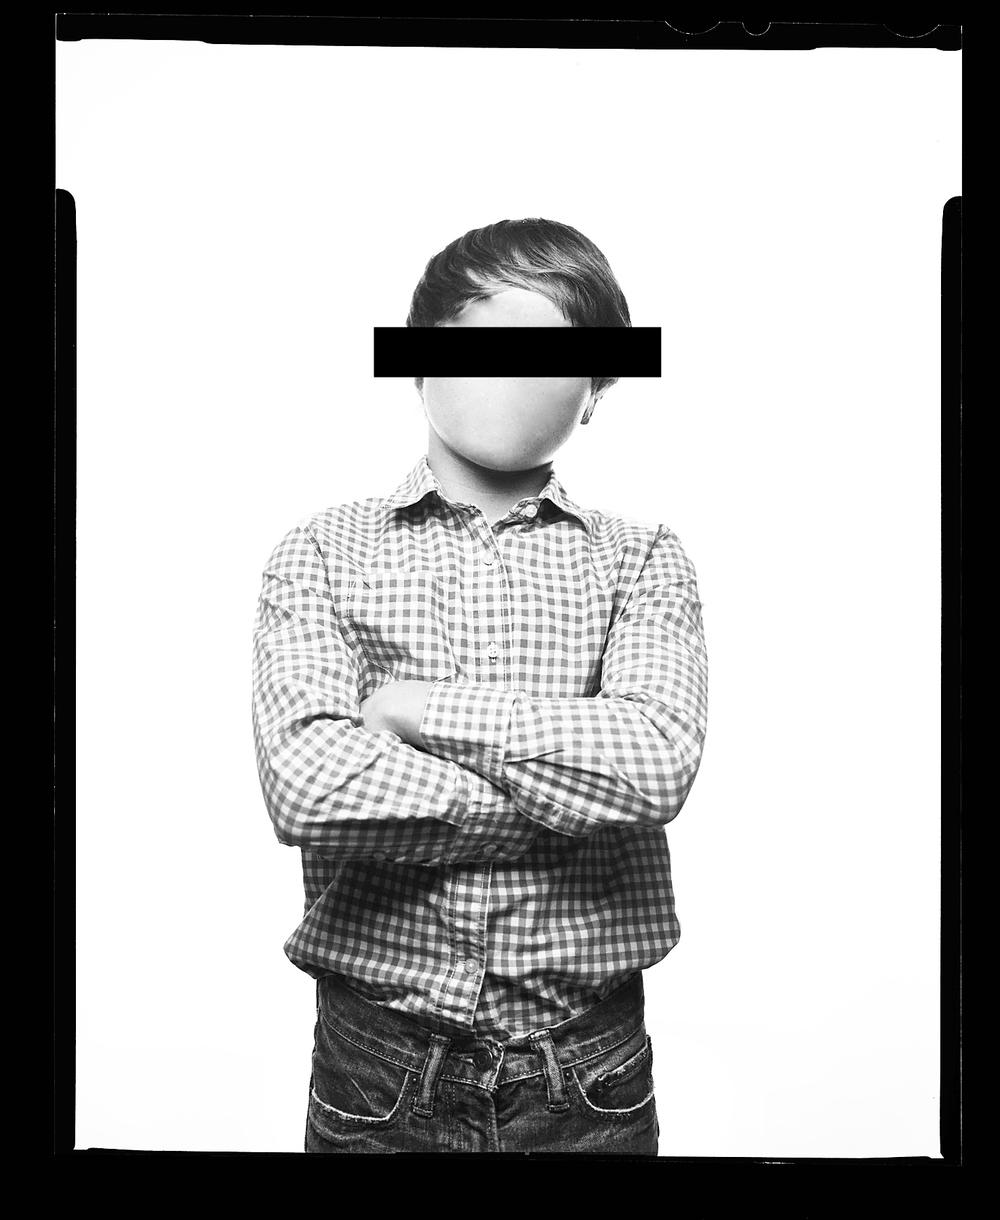 kid_web2.jpg